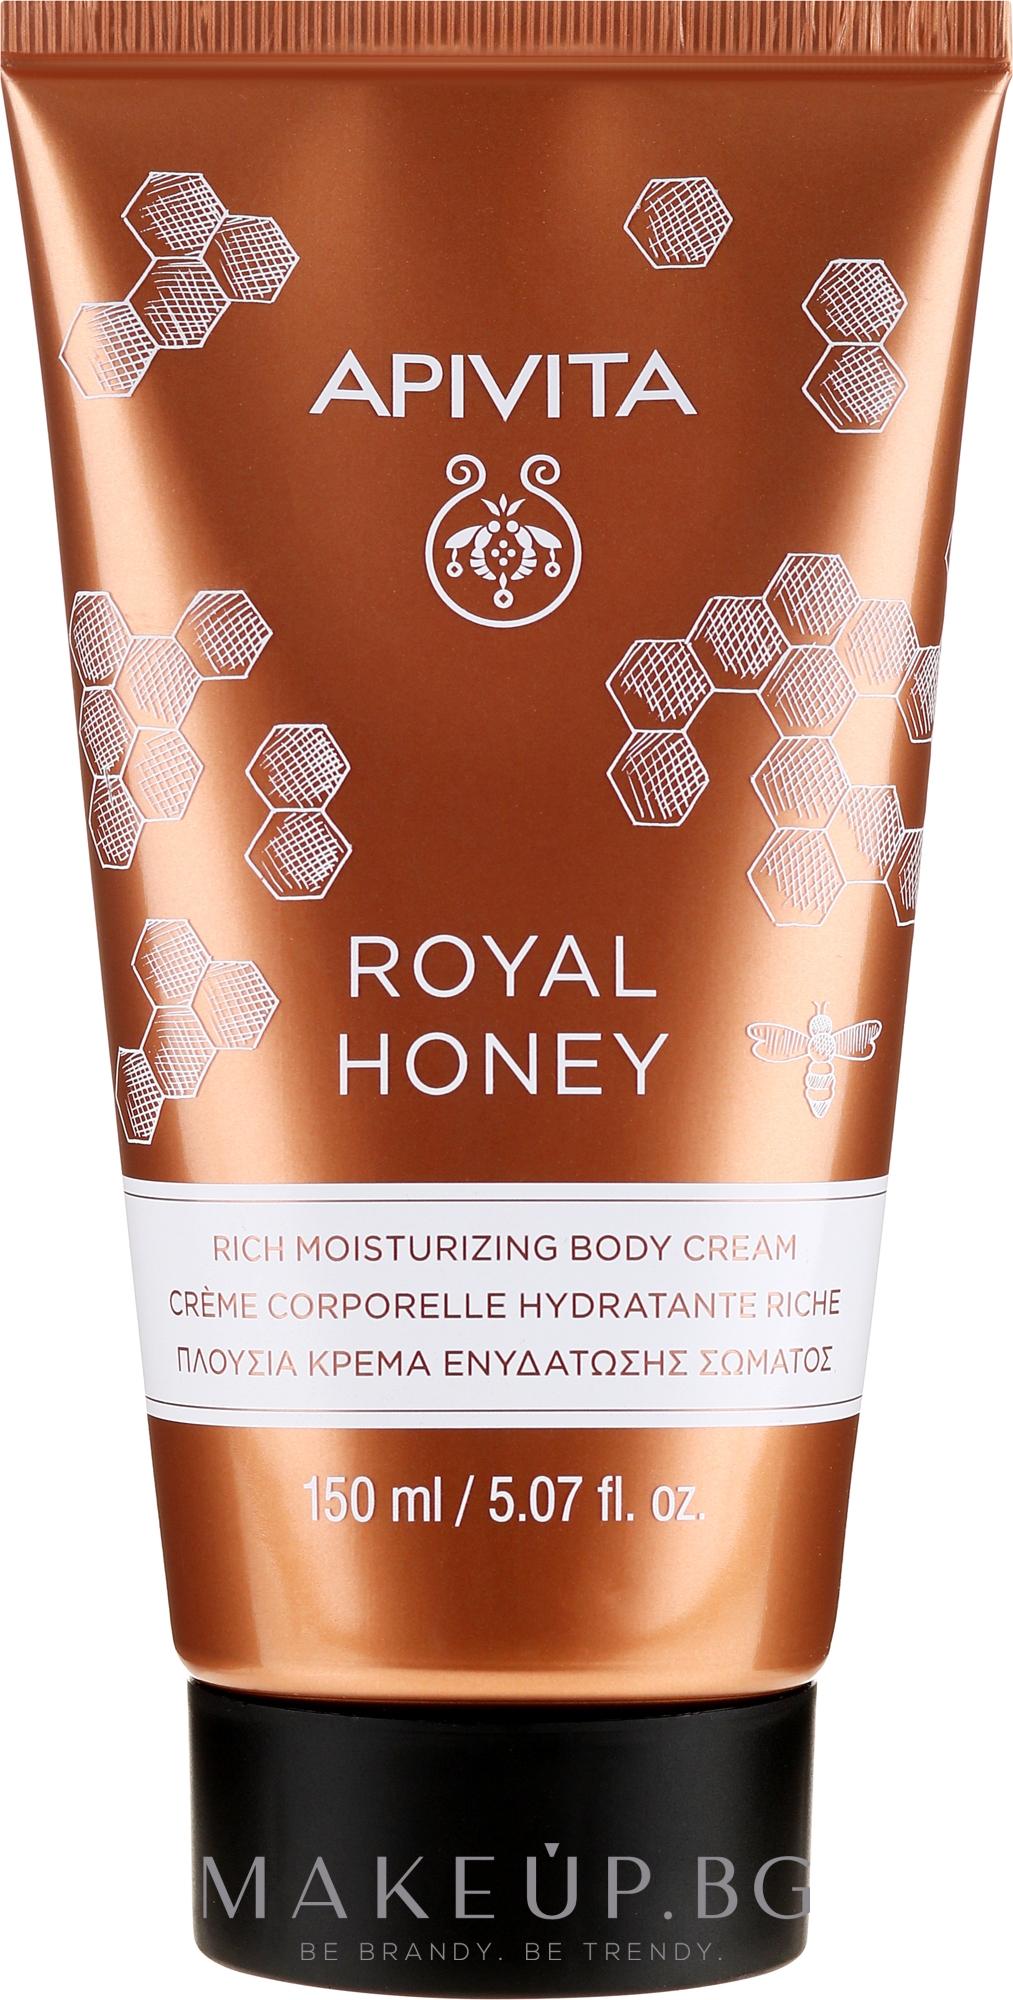 Хидратиращ крем за тяло - Apivita Royal Honey Rich Moisturizing Body Cream — снимка 150 ml